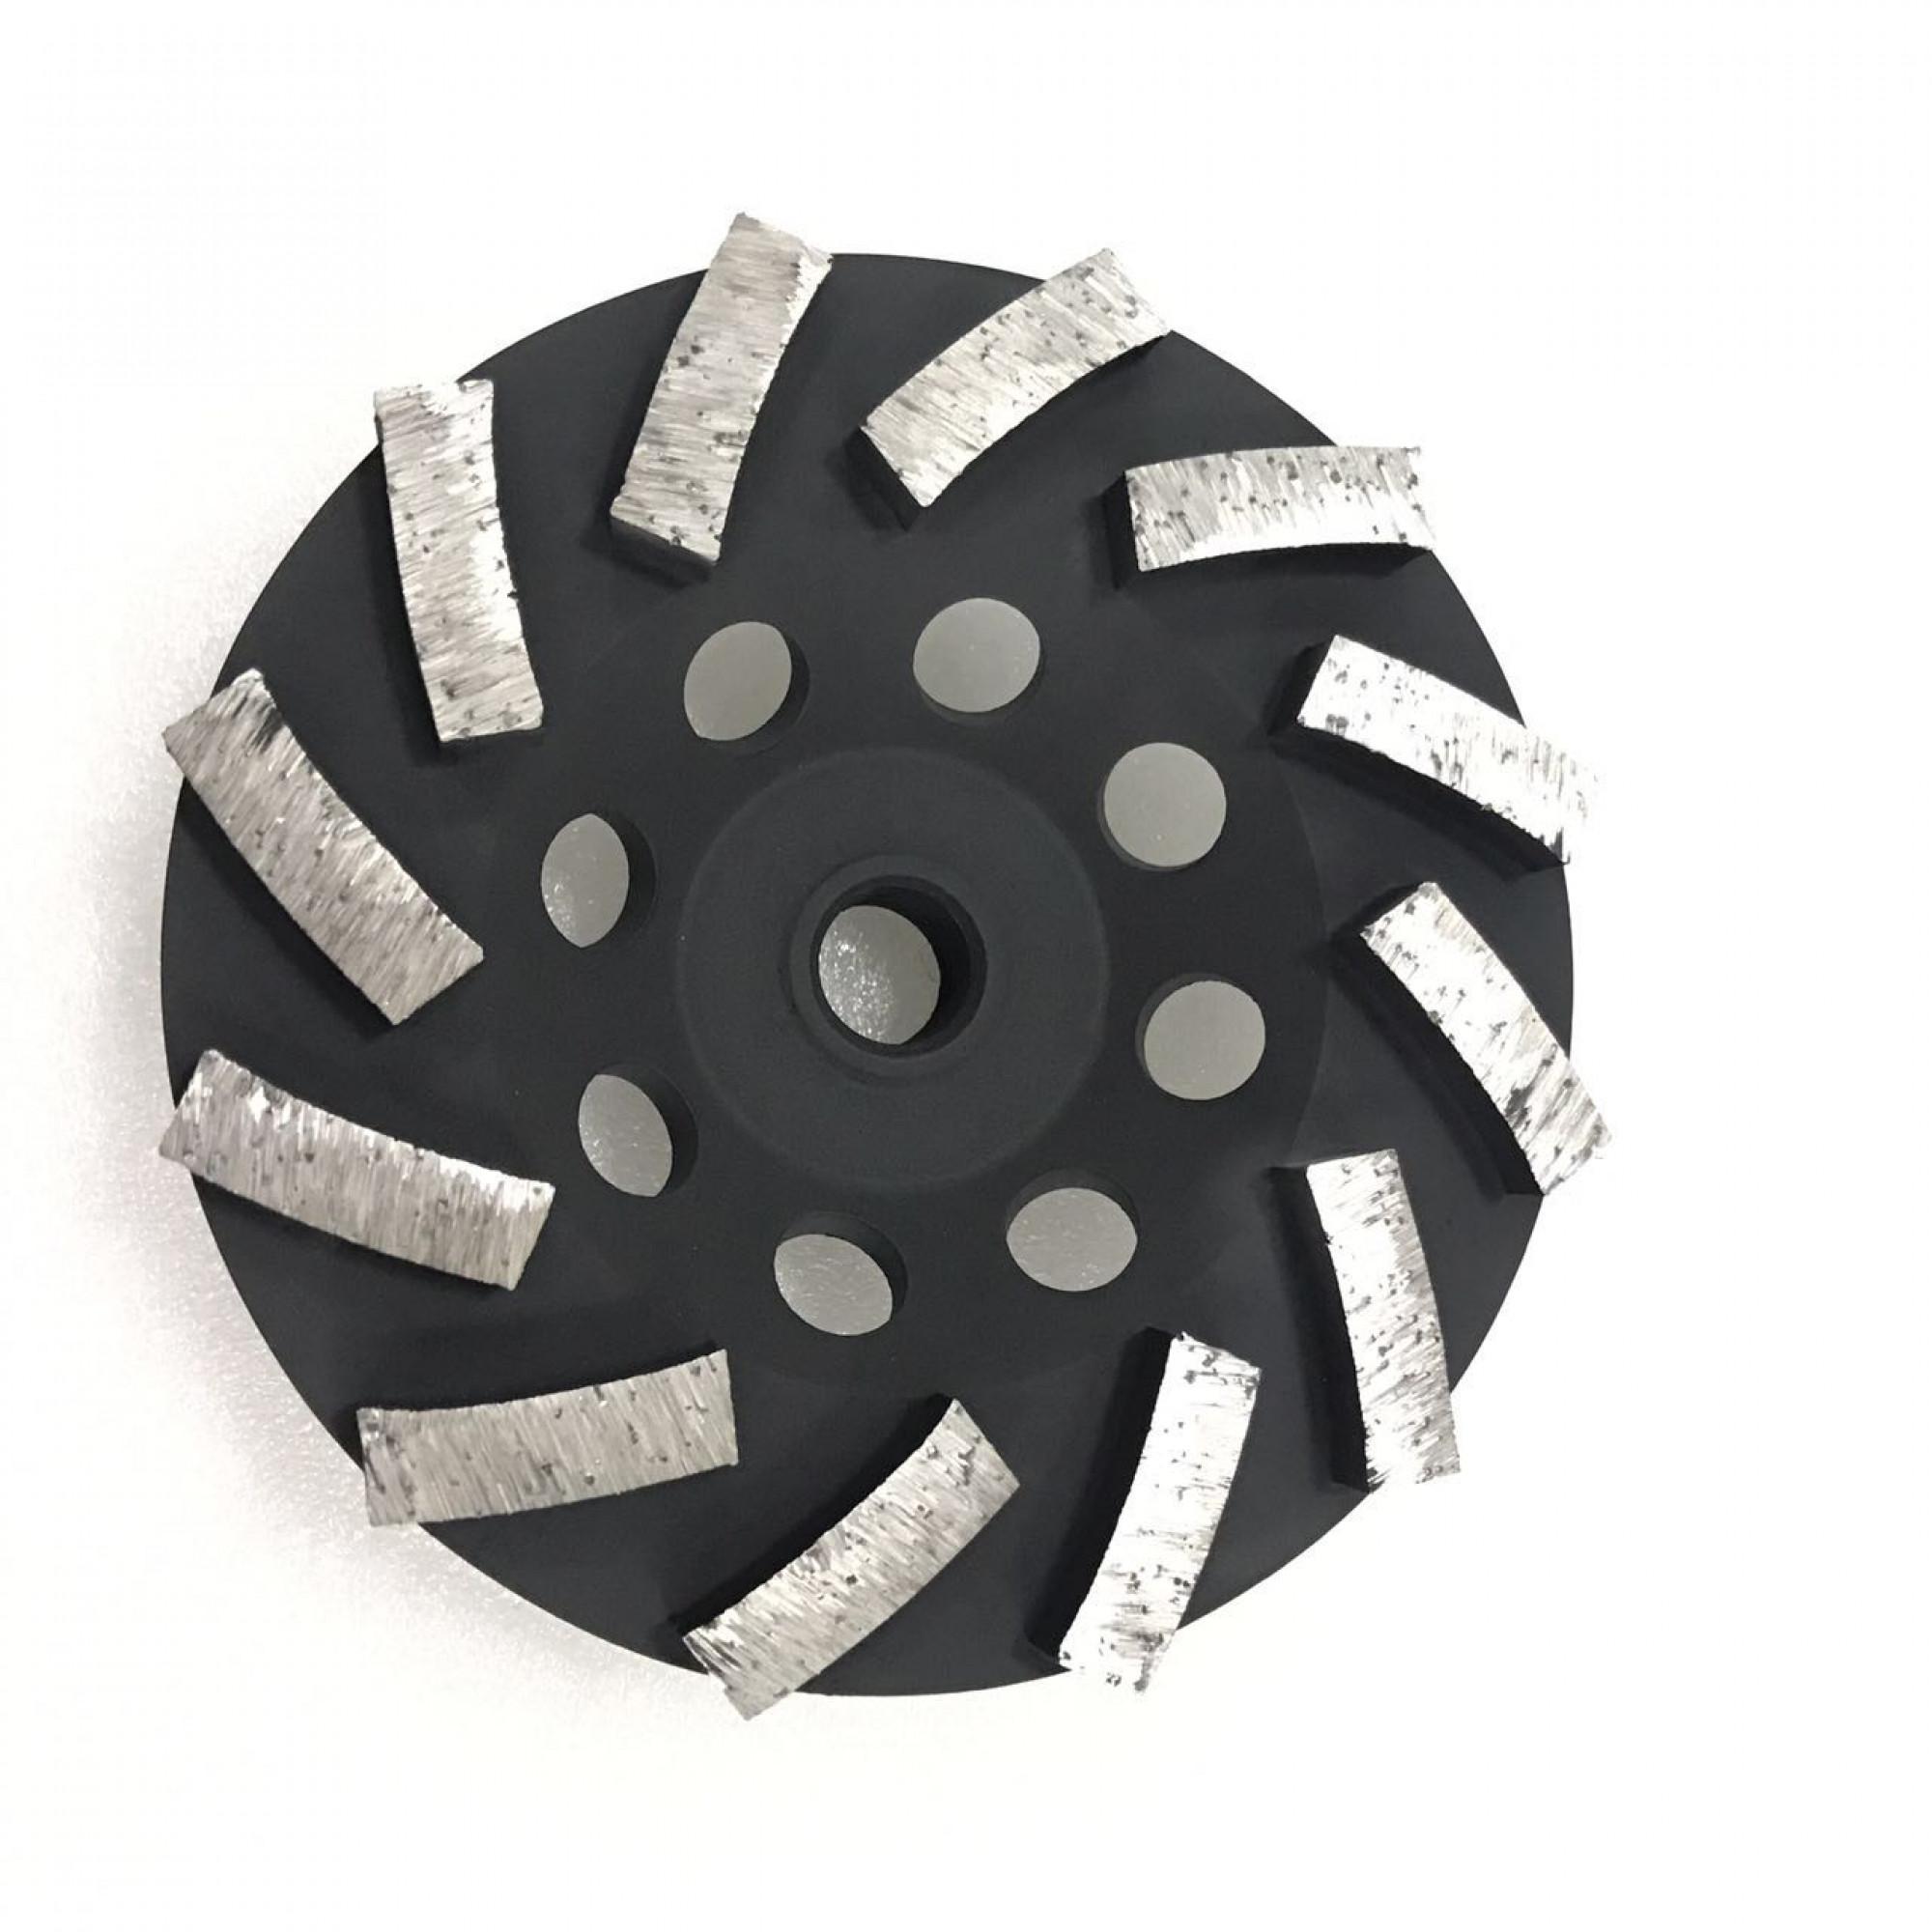 12 SEGMENT CUP WHEEL - 7 inch